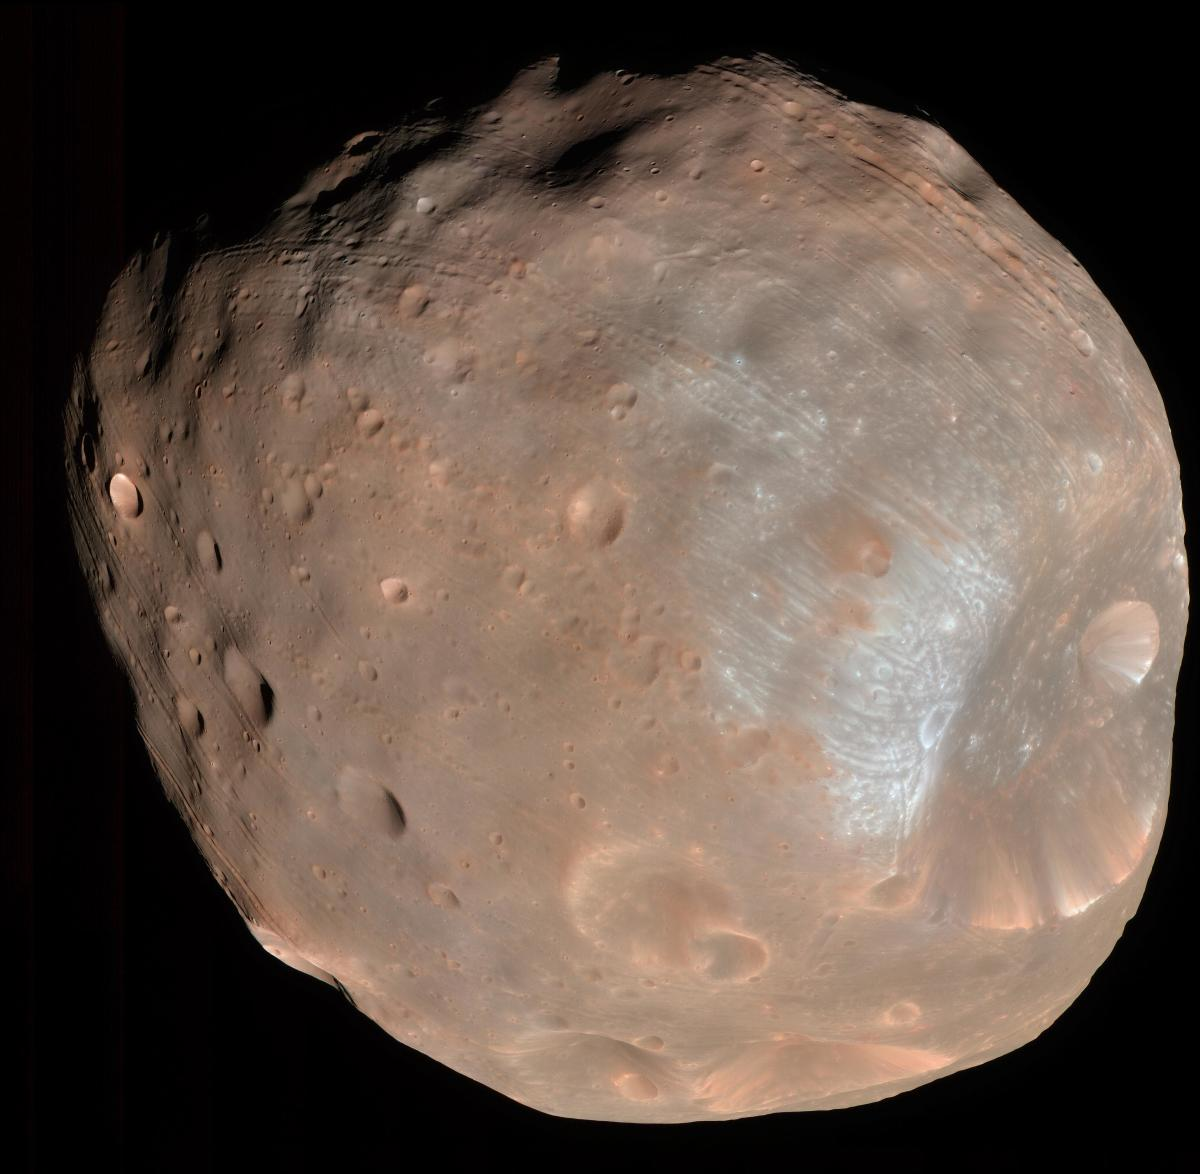 Phobos, a tiny moon of Mars, is doomed to destruction (Mars Reconnaissance Orbiter)